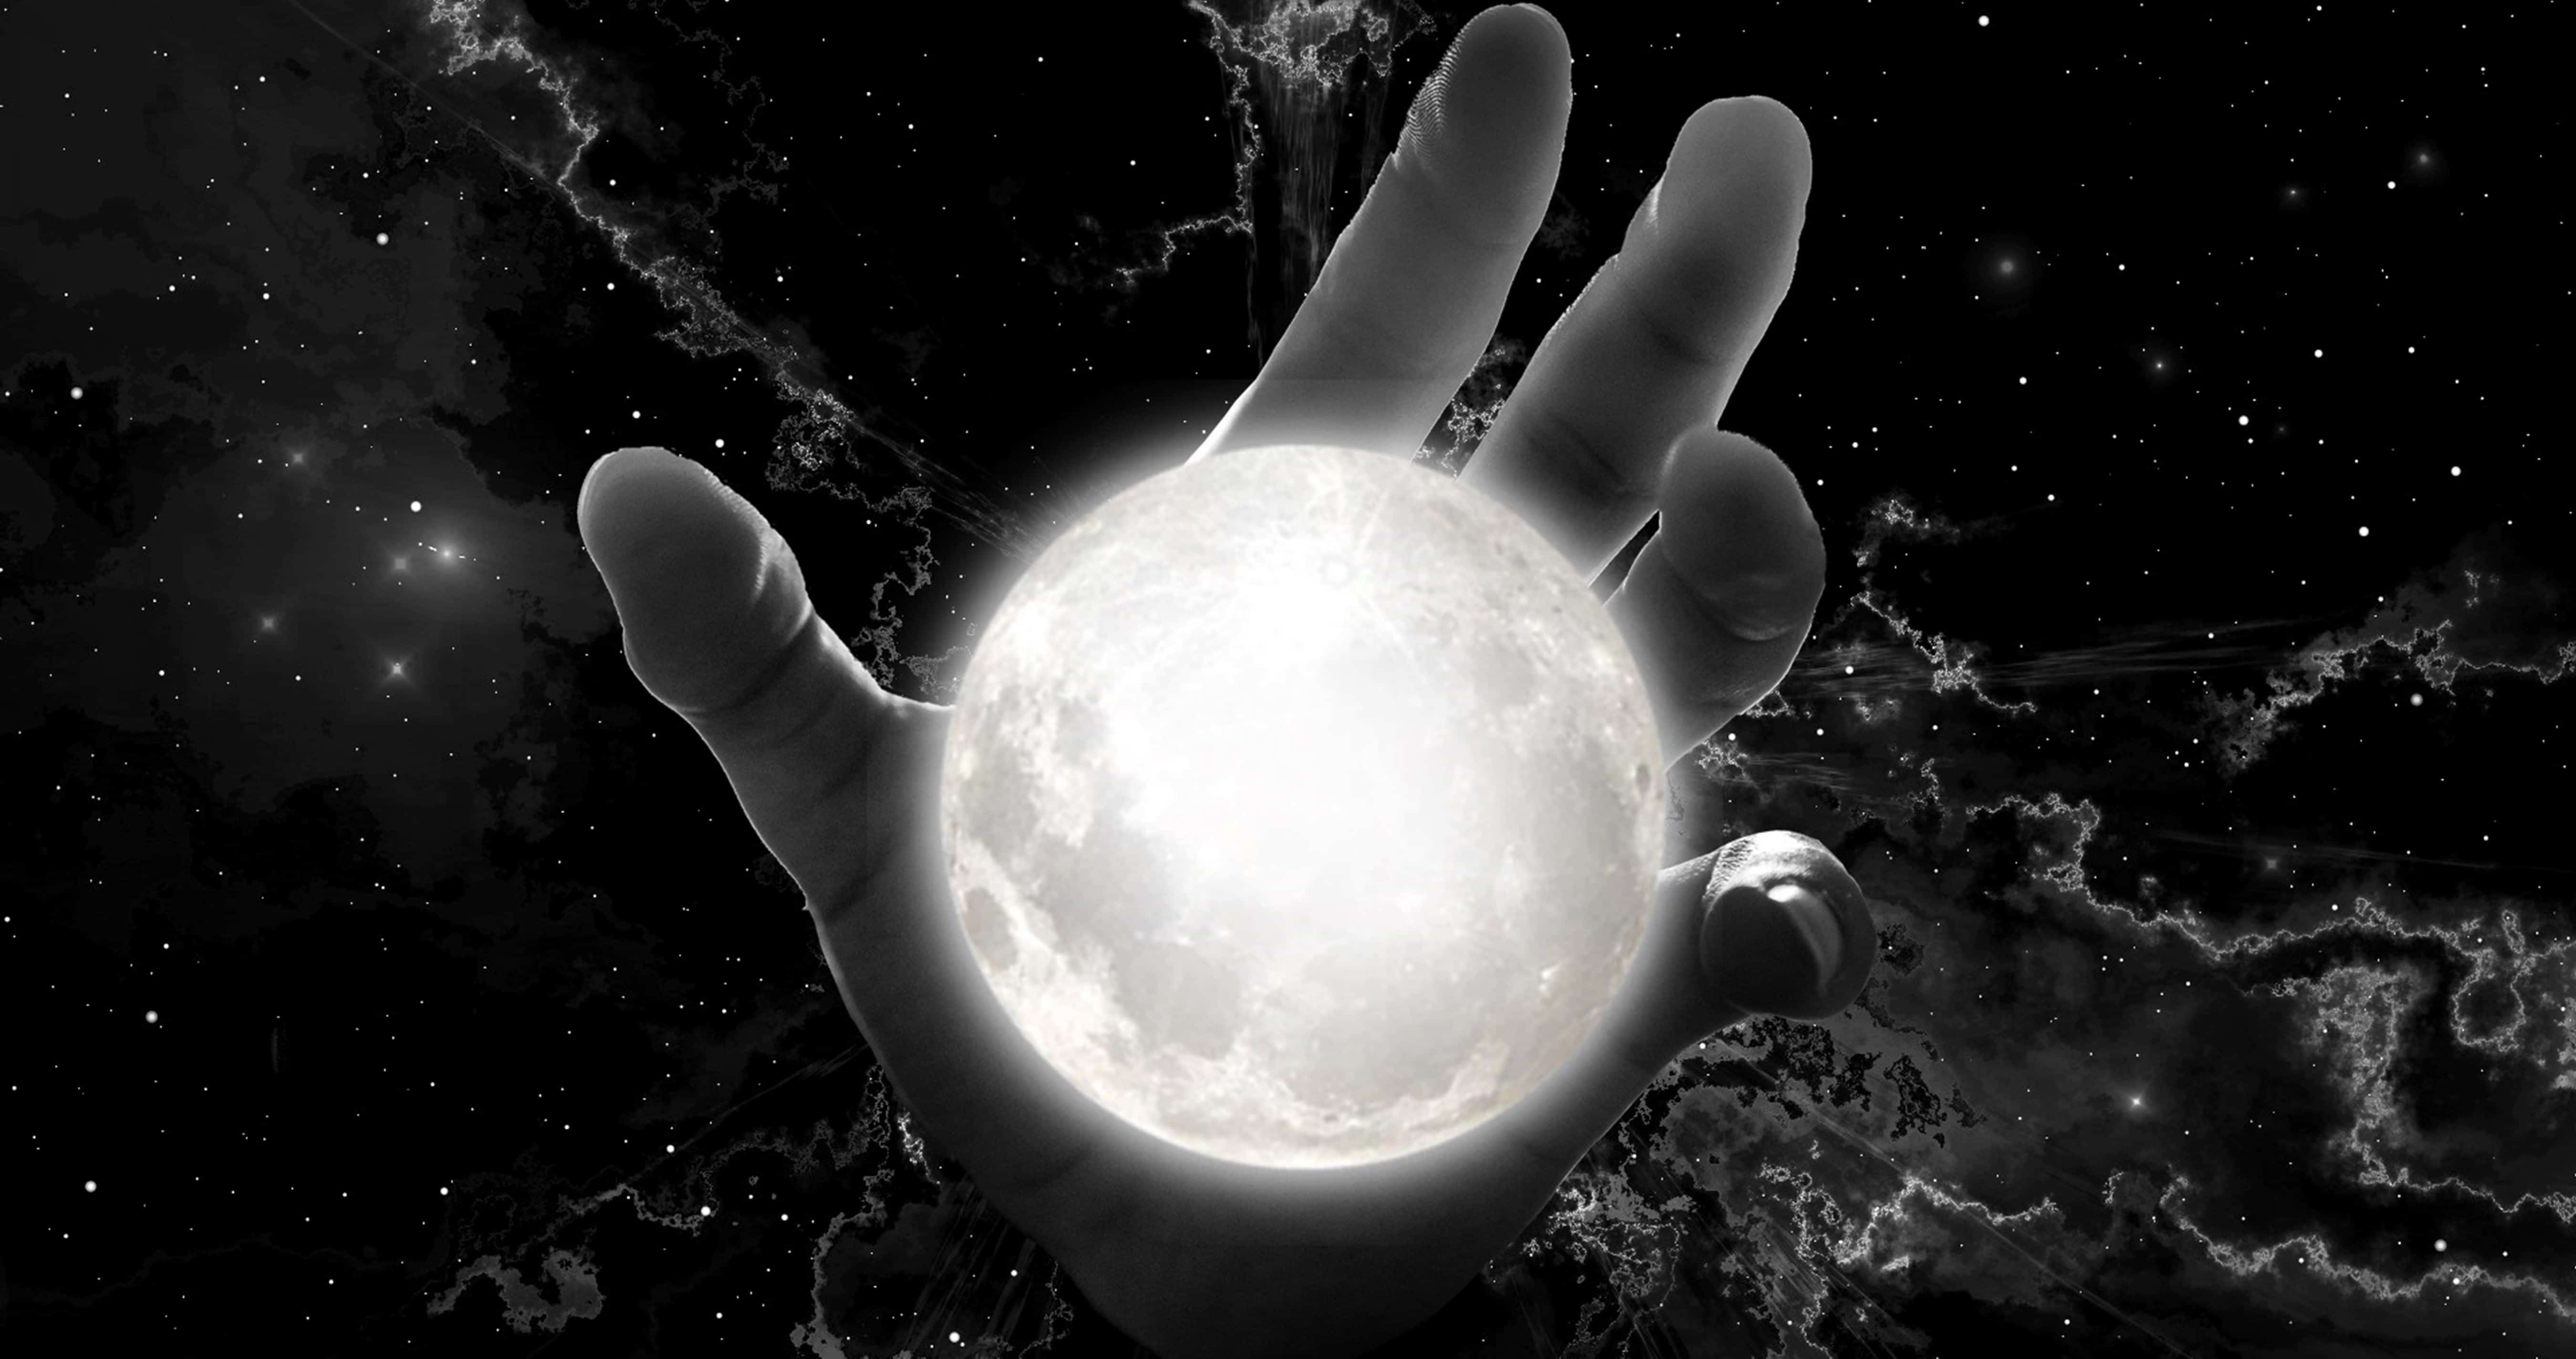 Wereldbol Met Licht : Gratis afbeelding: planeet maan fotomontage monochroom arm bol